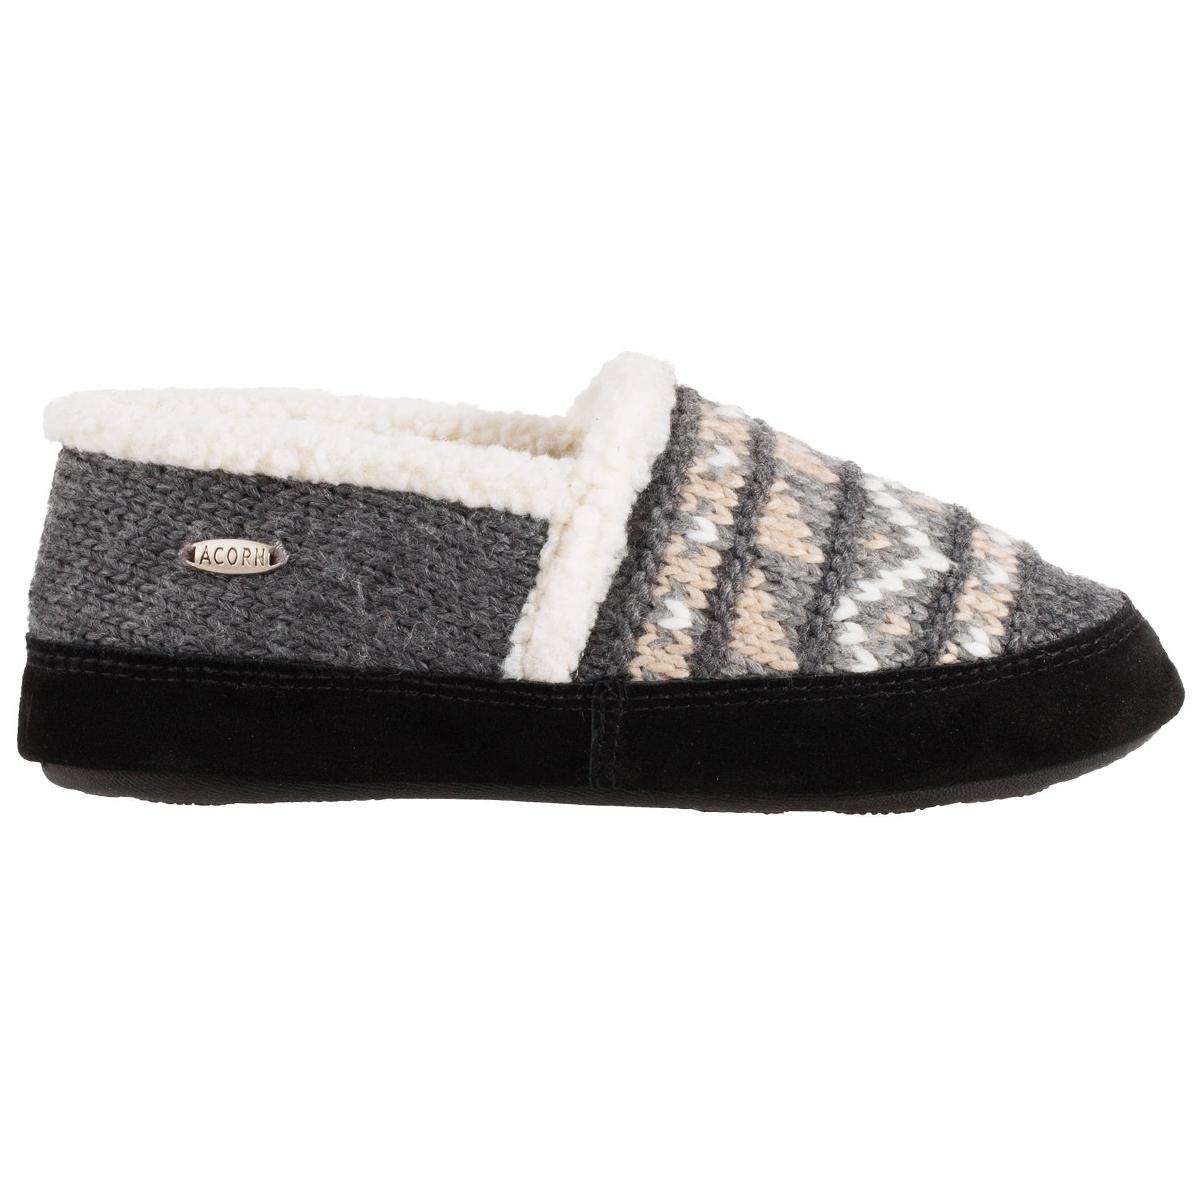 Acorn Women's Nordic Moc Slippers - Black, L